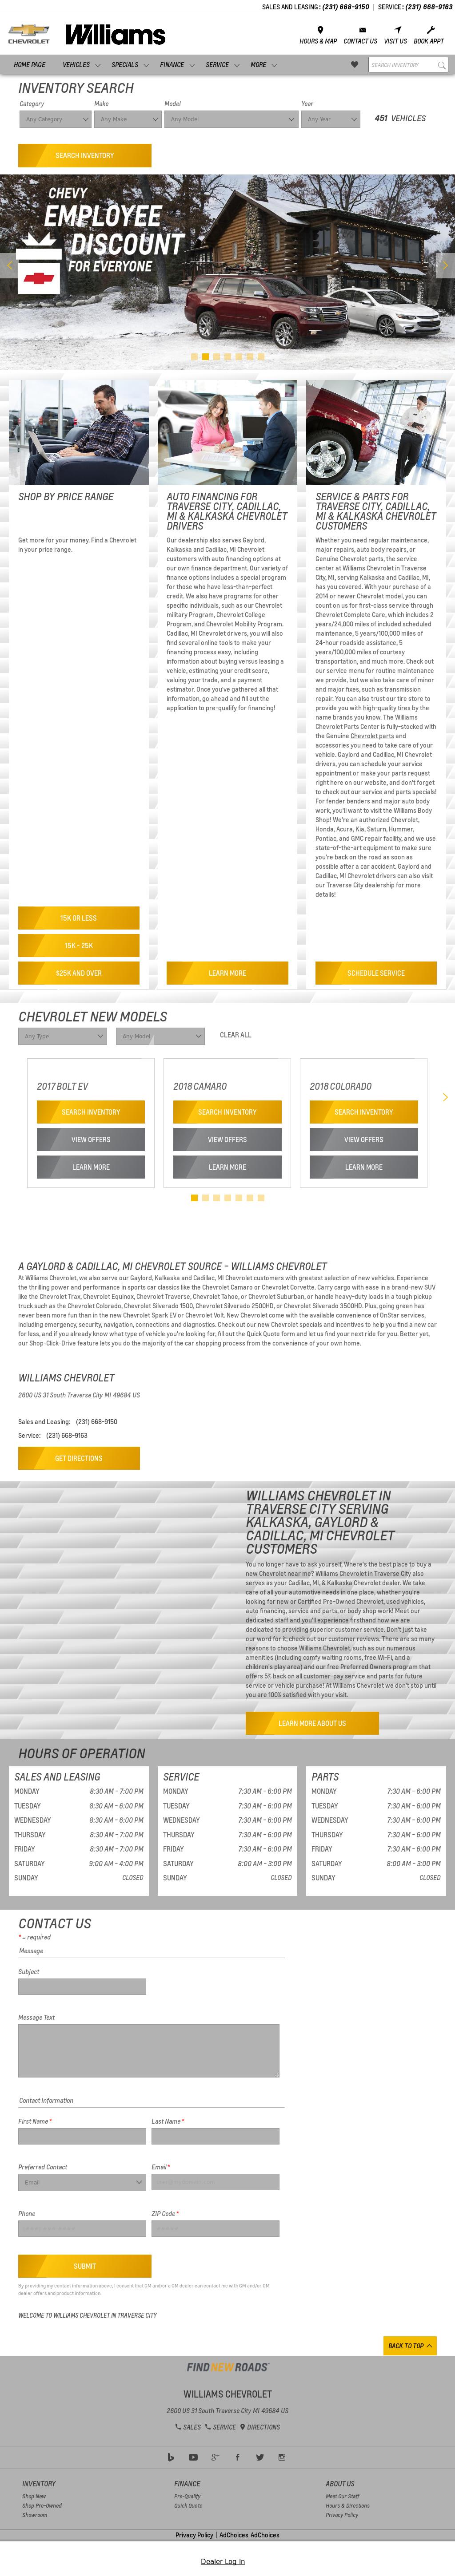 Williams Chevrolet Honda Geo Website History